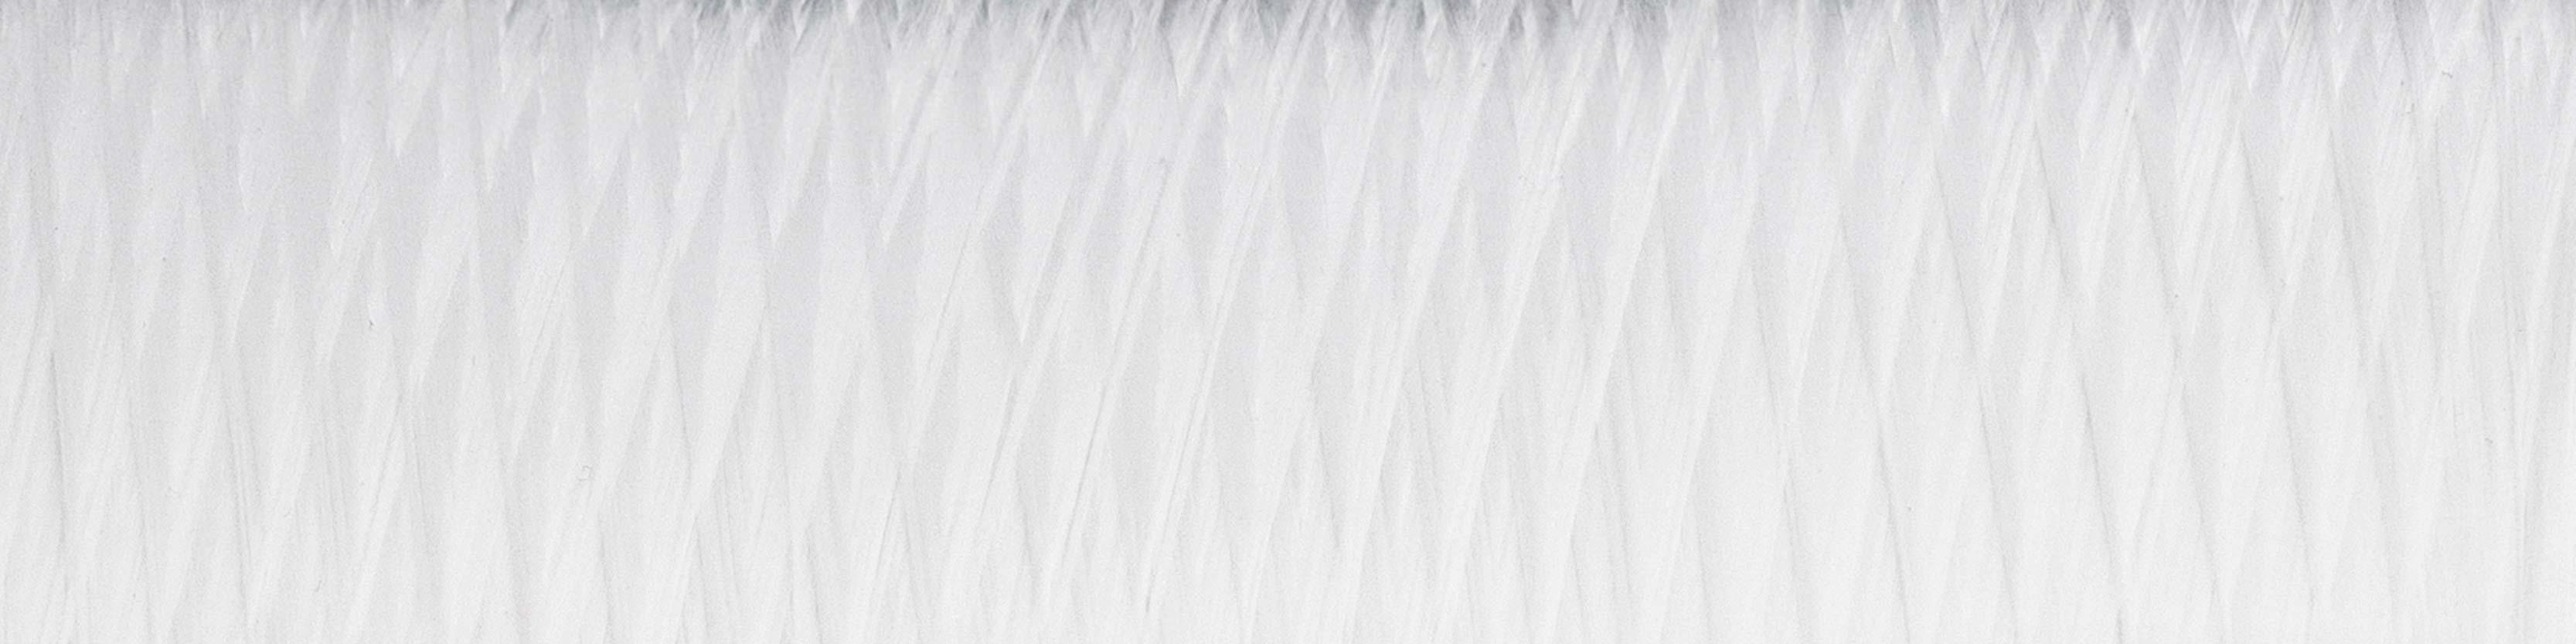 BRILEN Polyester Industrial Yarns GLE High Tenacity High Modulus PES